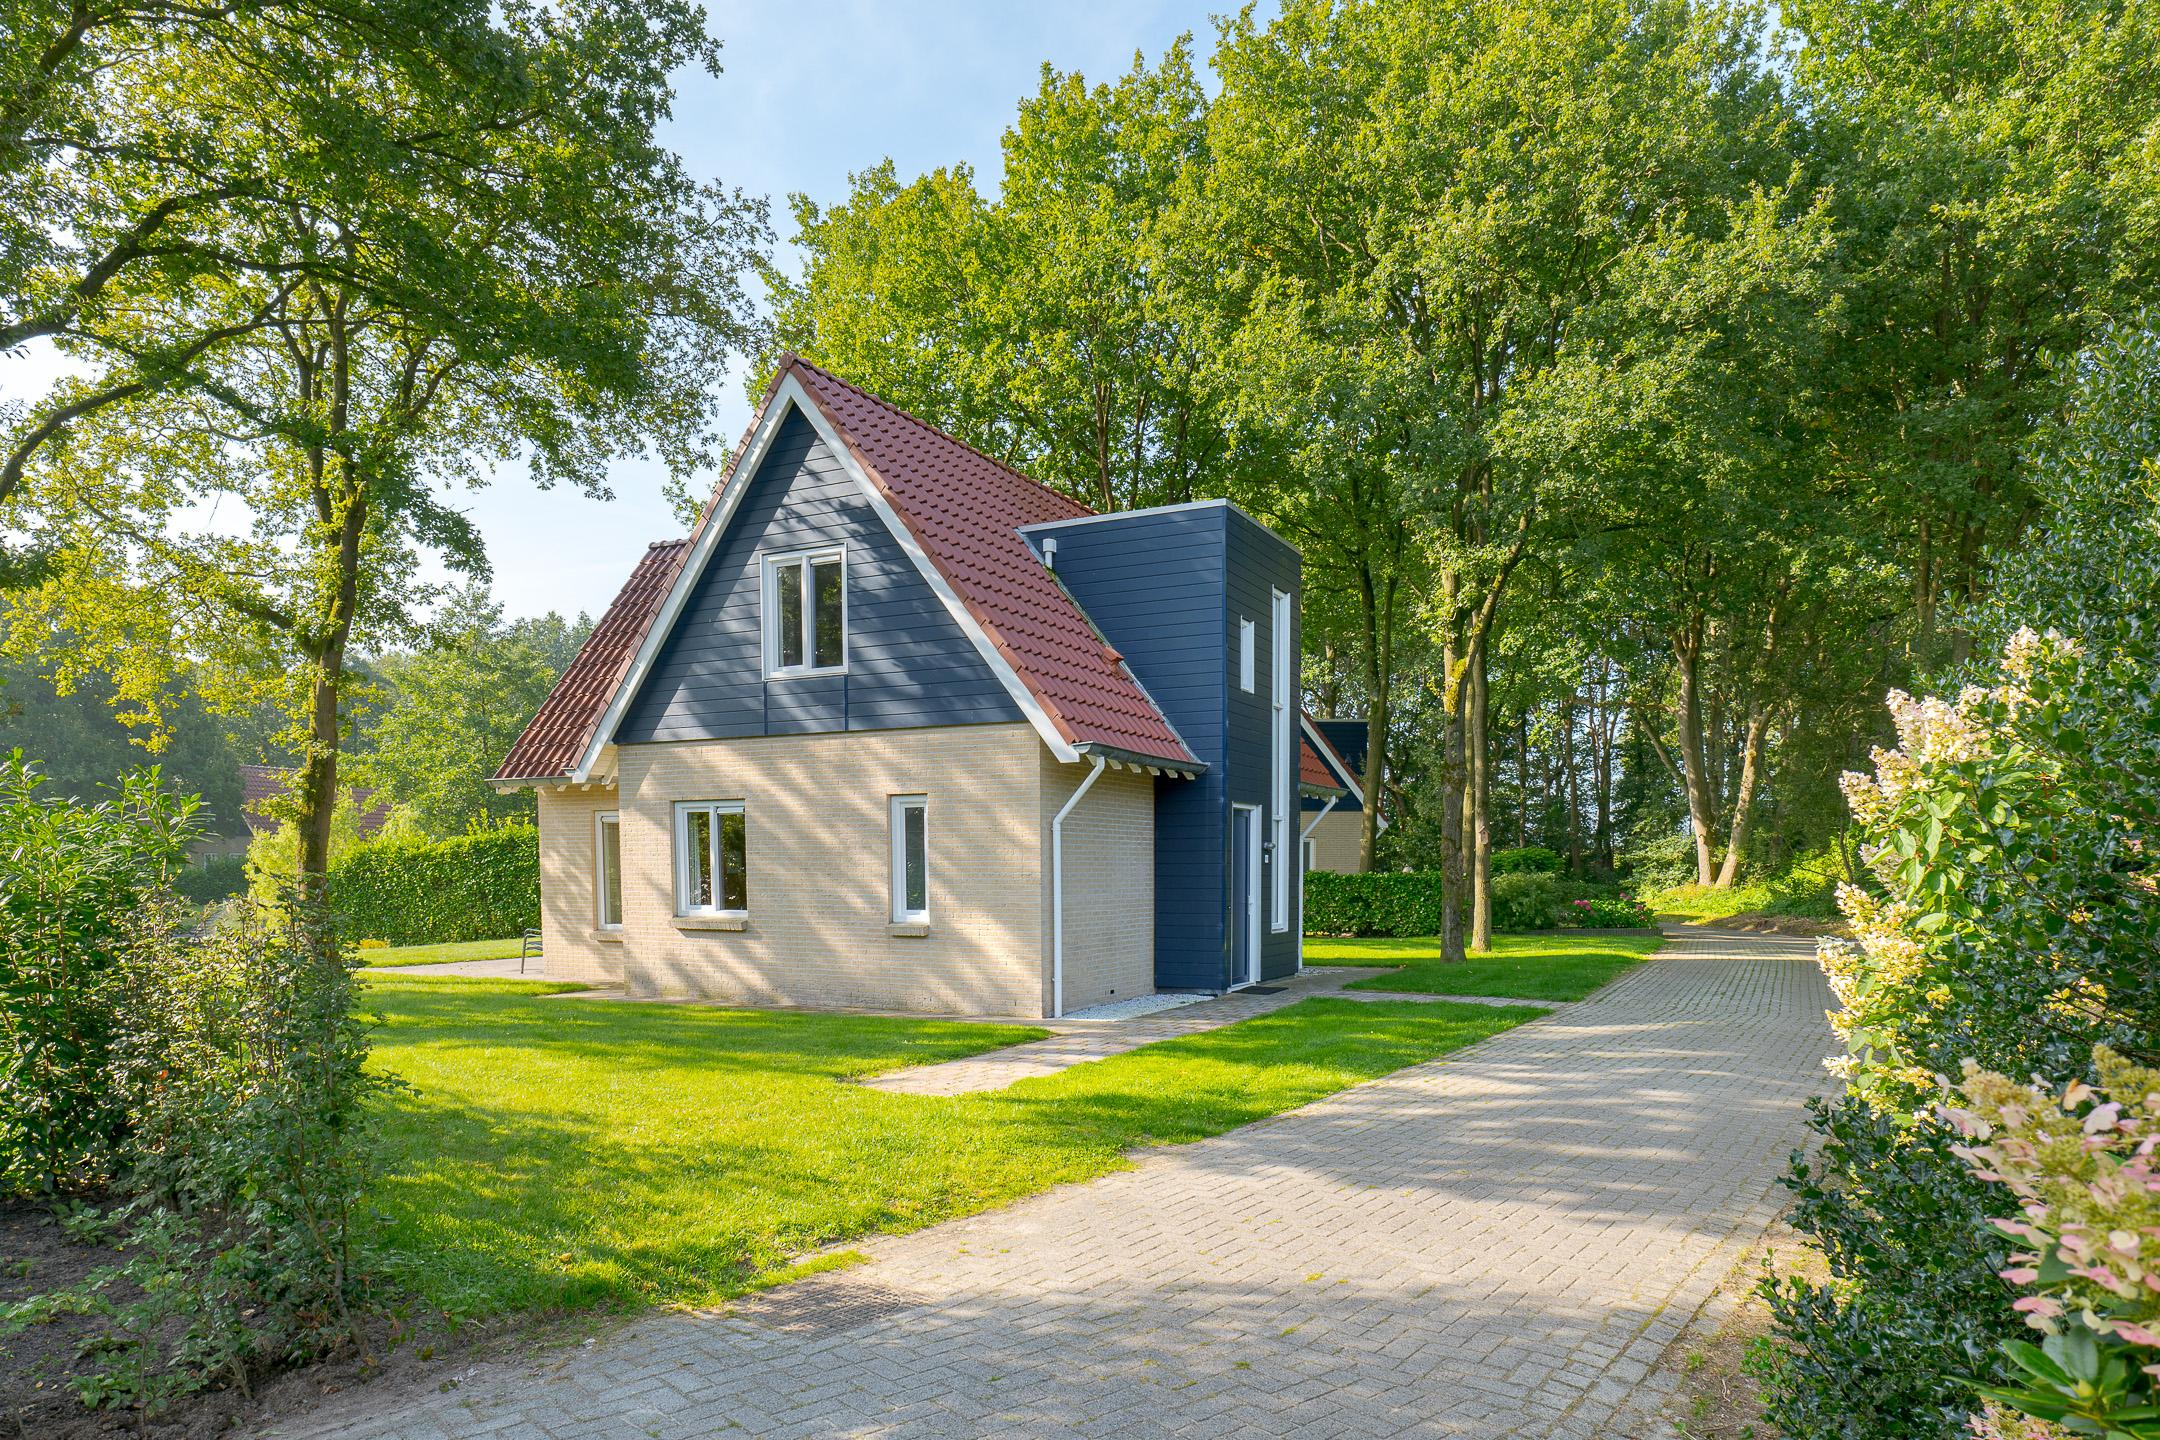 Gagelmaat, Drenthe, 2005 Slaapkamers Slaapkamers, ,5 BadkamerBadkamer,Recreatiewoning,Te koop,Gagelmaat,2,1227